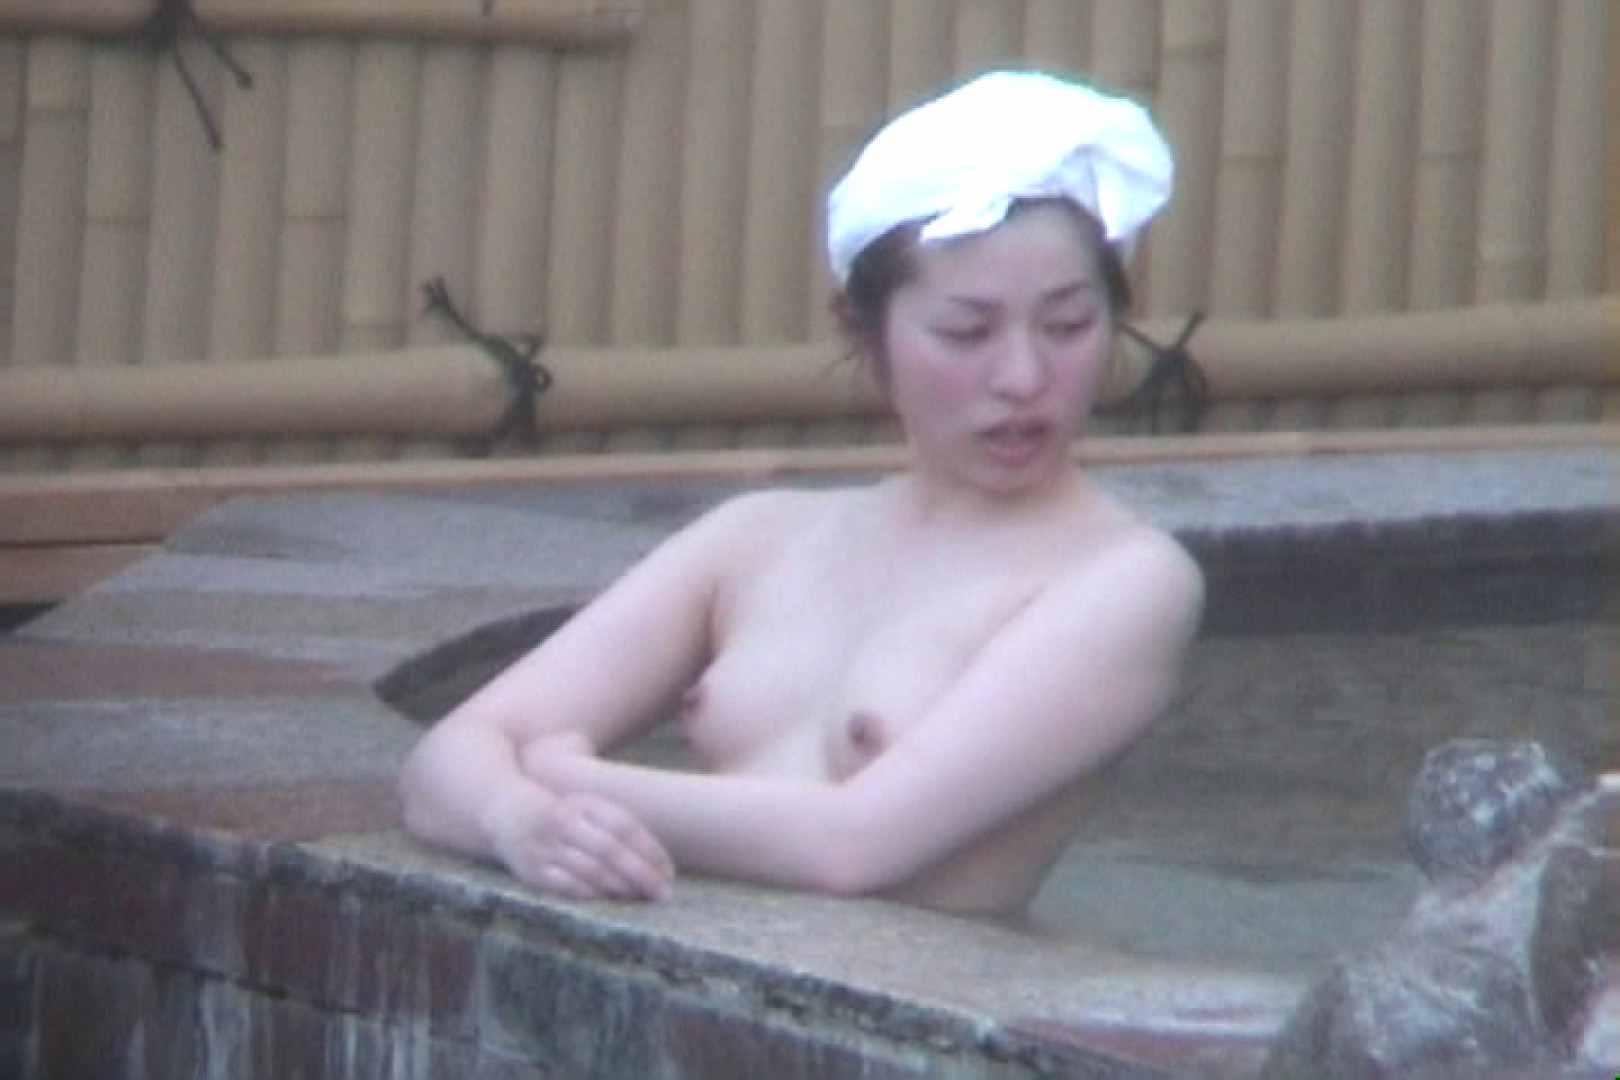 Aquaな露天風呂Vol.86【VIP限定】 OLのエロ生活 オマンコ無修正動画無料 96連発 8